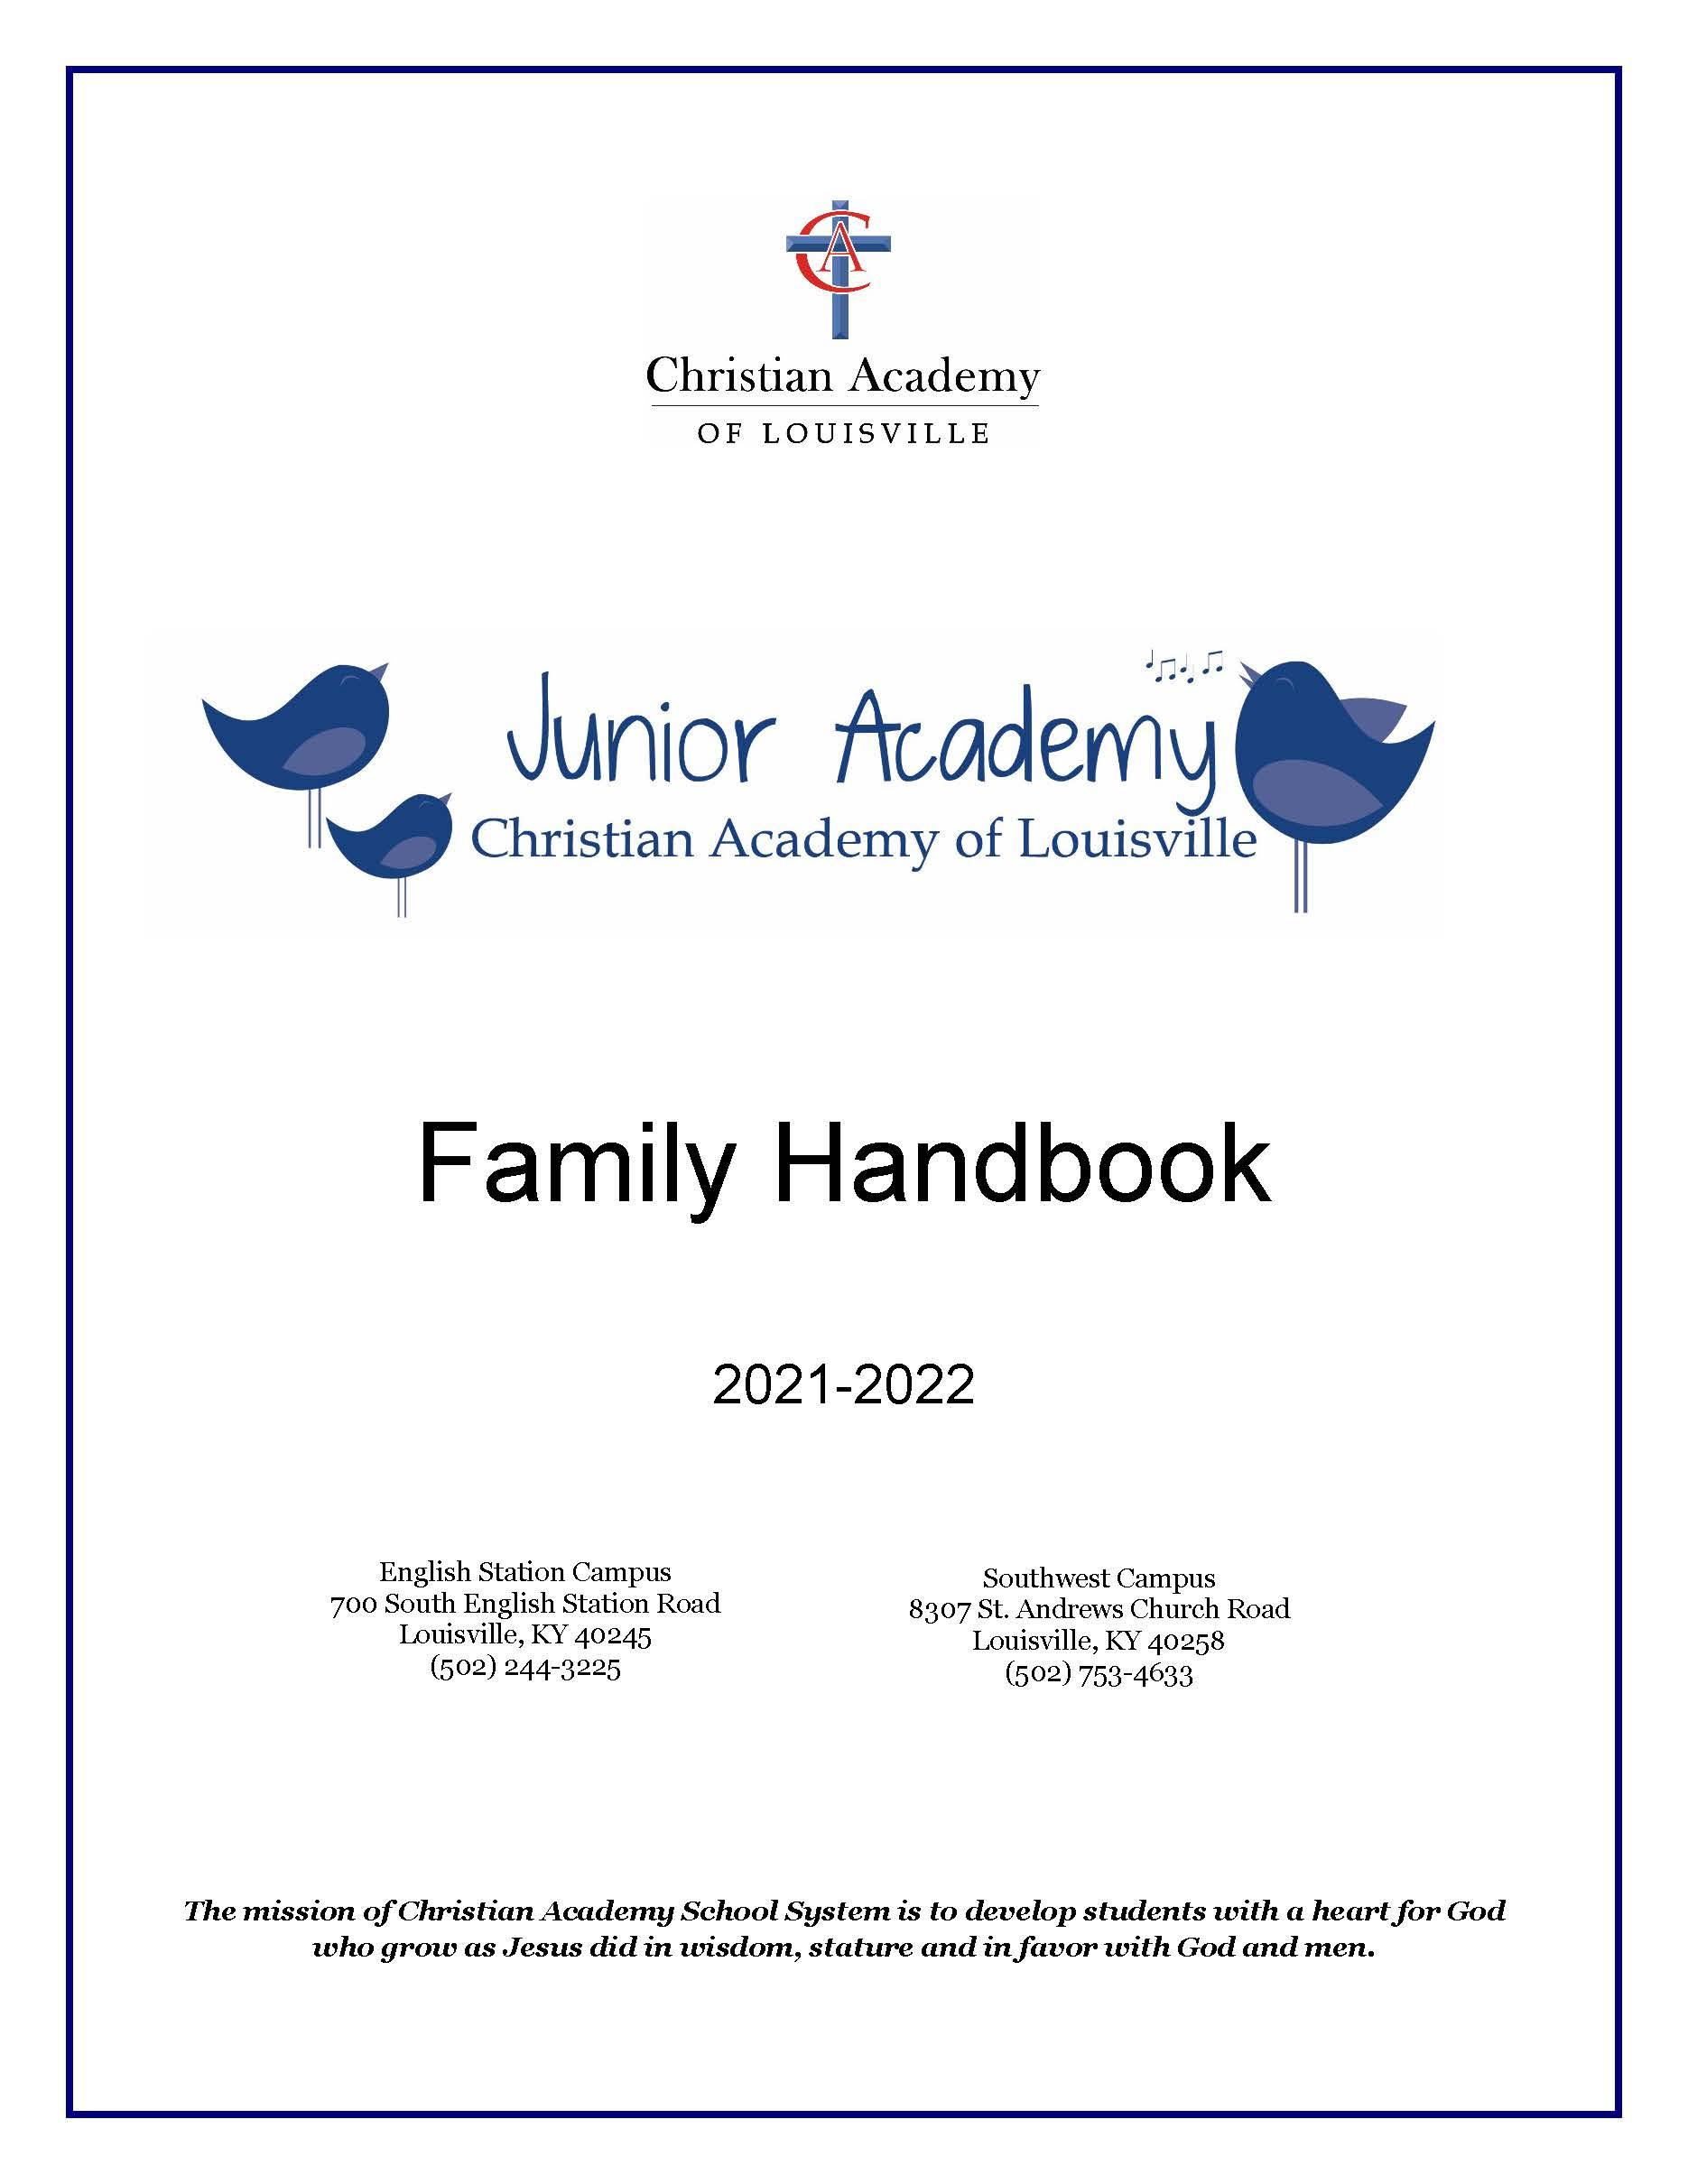 Christian Academy School System | Christian Academy of Louisville - Southwest | 2021-2022 Family Handbook